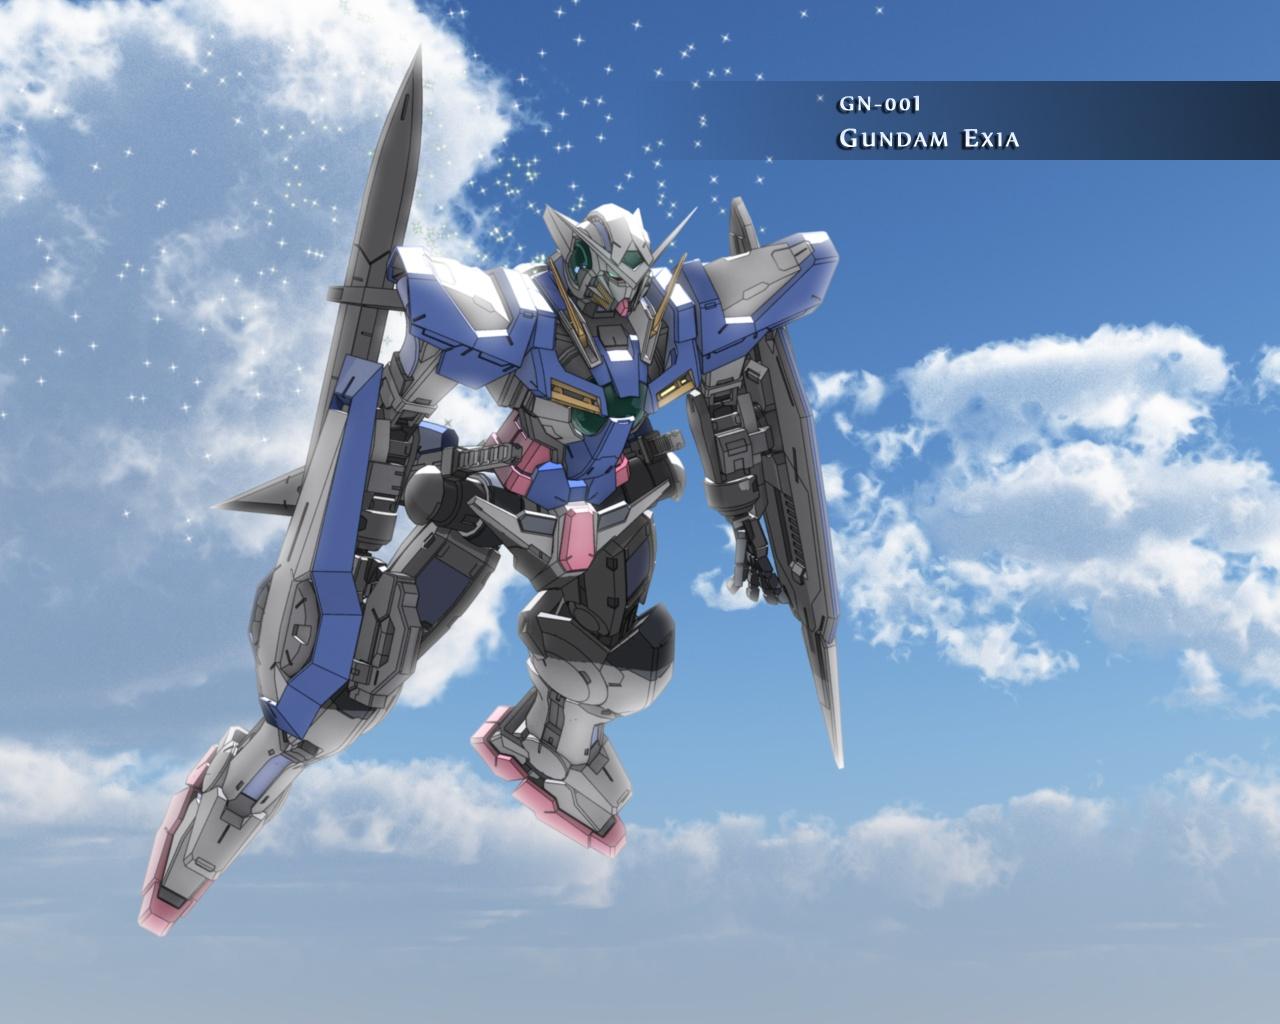 http://images4.wikia.nocookie.net/__cb20091109212056/gundam/images/c/ca/GN-001_Gundam_Exia_Sky_Wallpaper.jpg